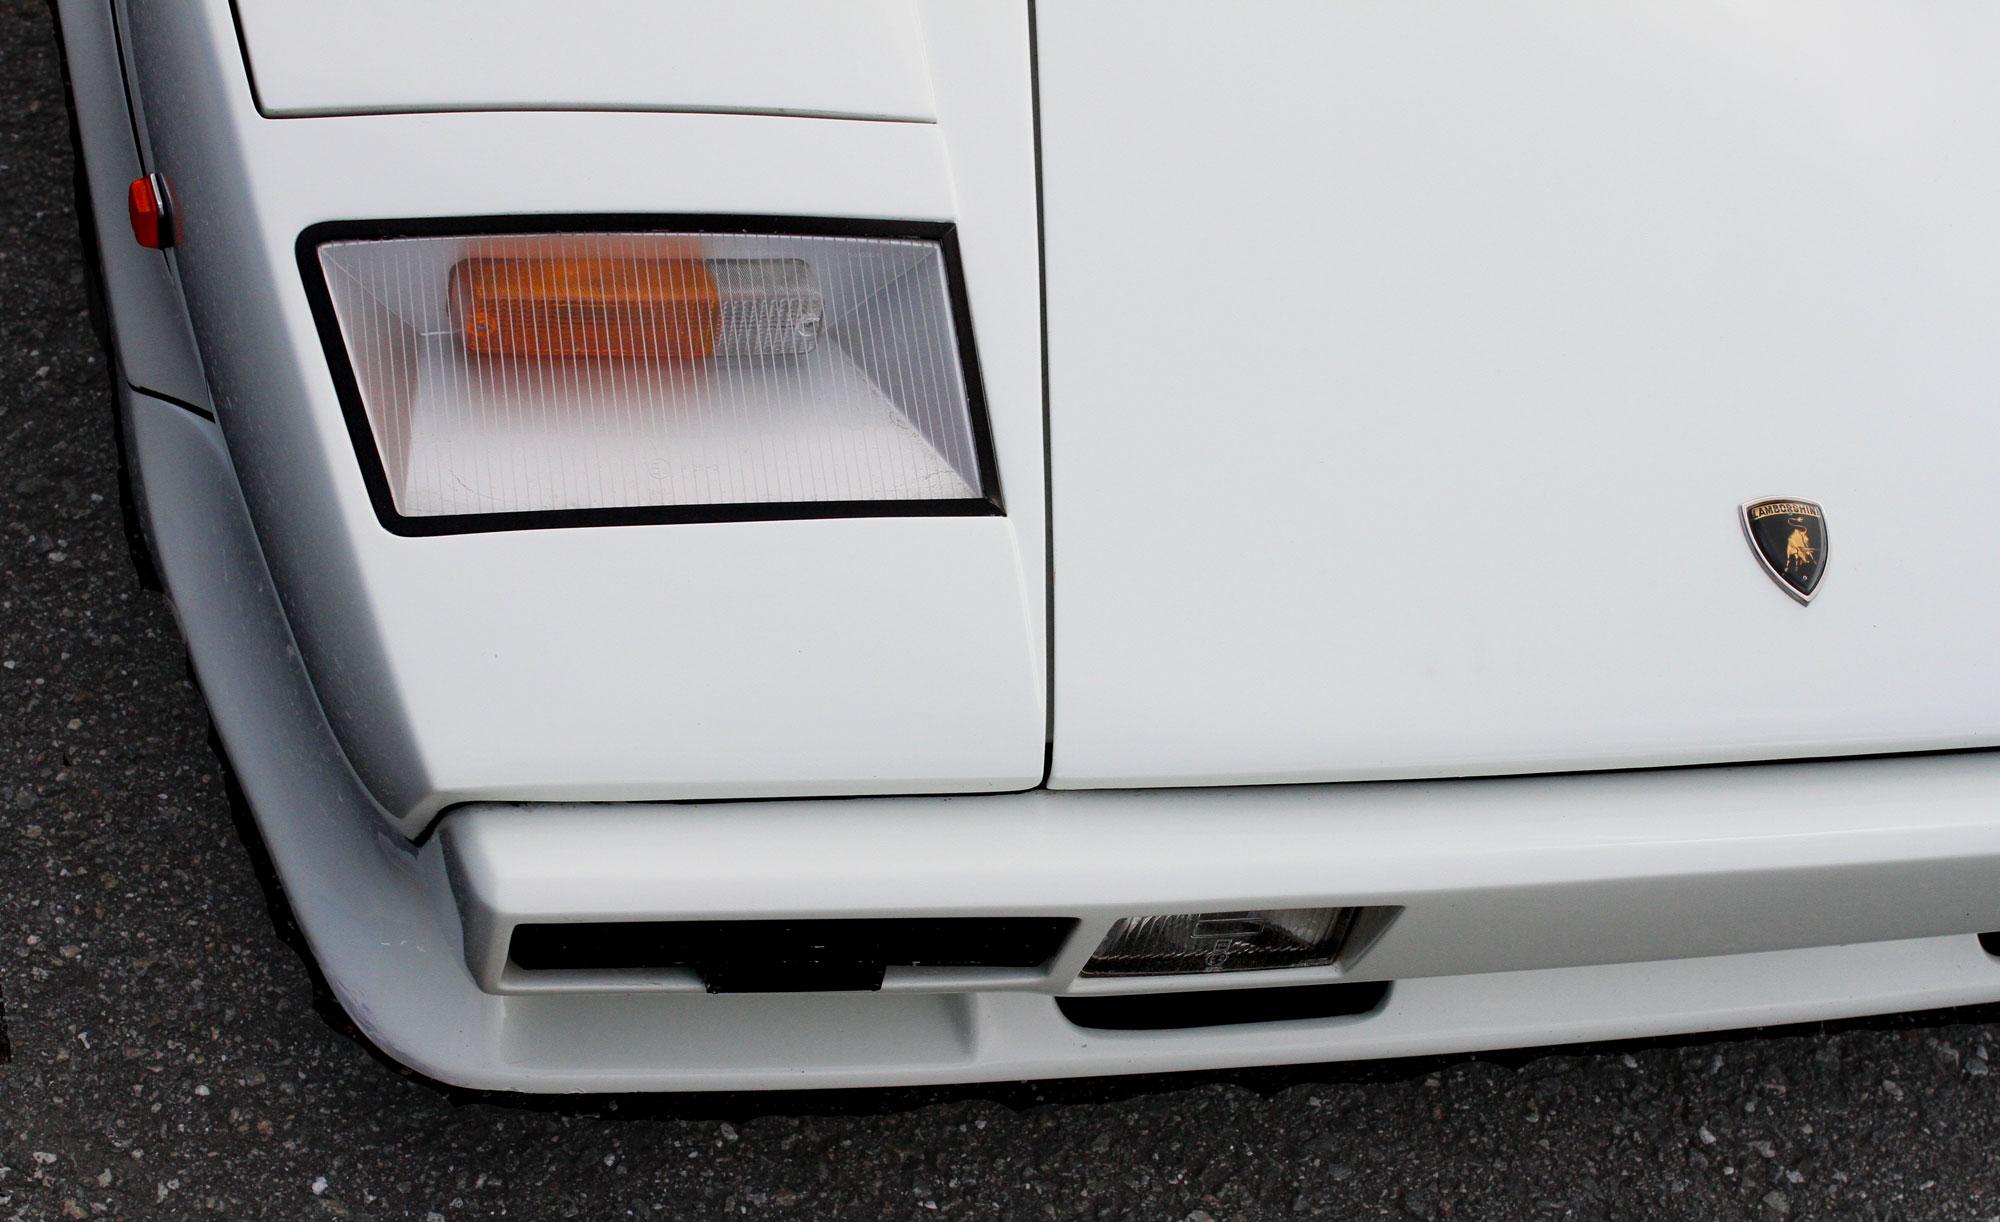 Vit Lamborghini Countach höger framlampa med Lambo emblemet på bagage luckan